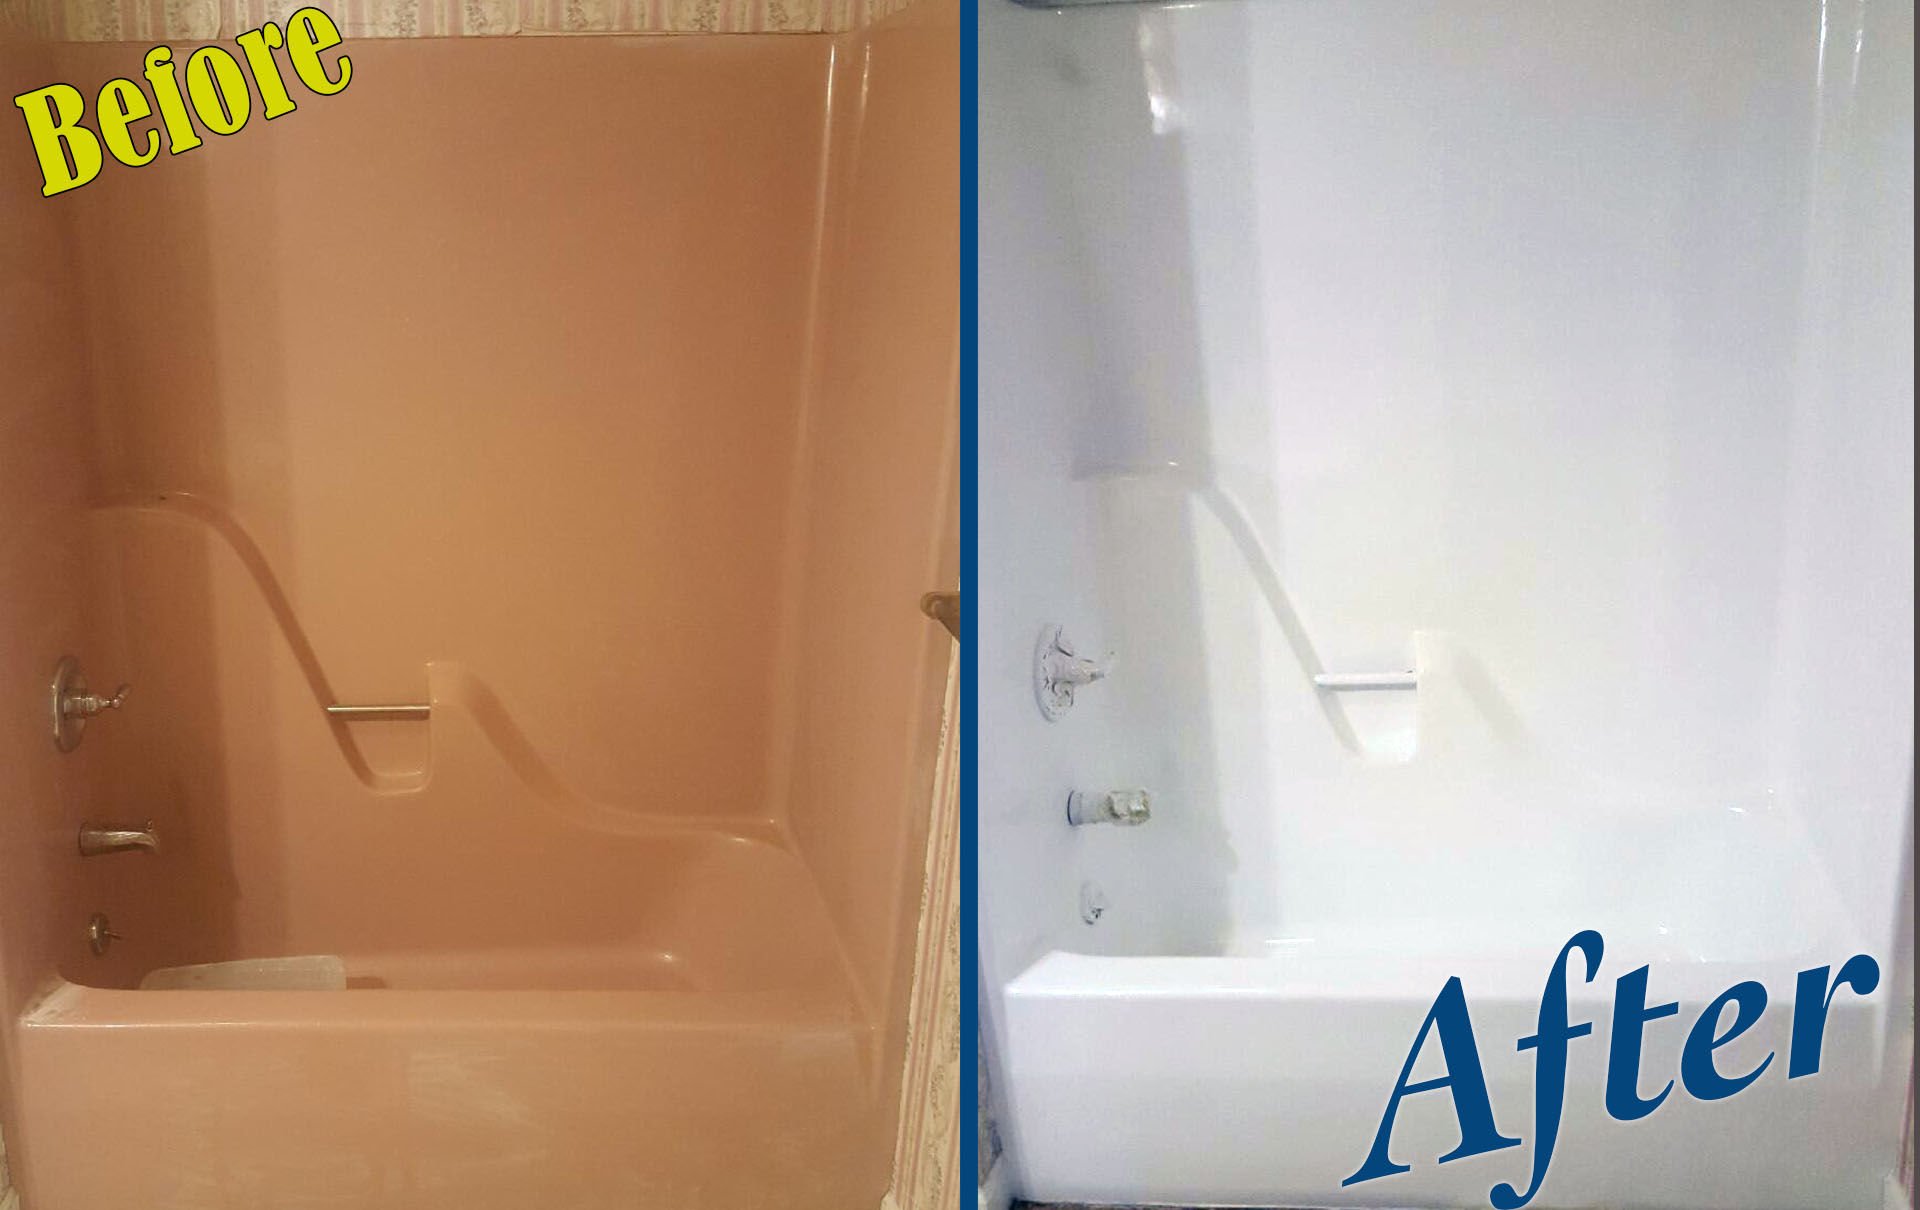 Bathtub Refinishing Columbia - 22 Years Experience - 803-636-8684